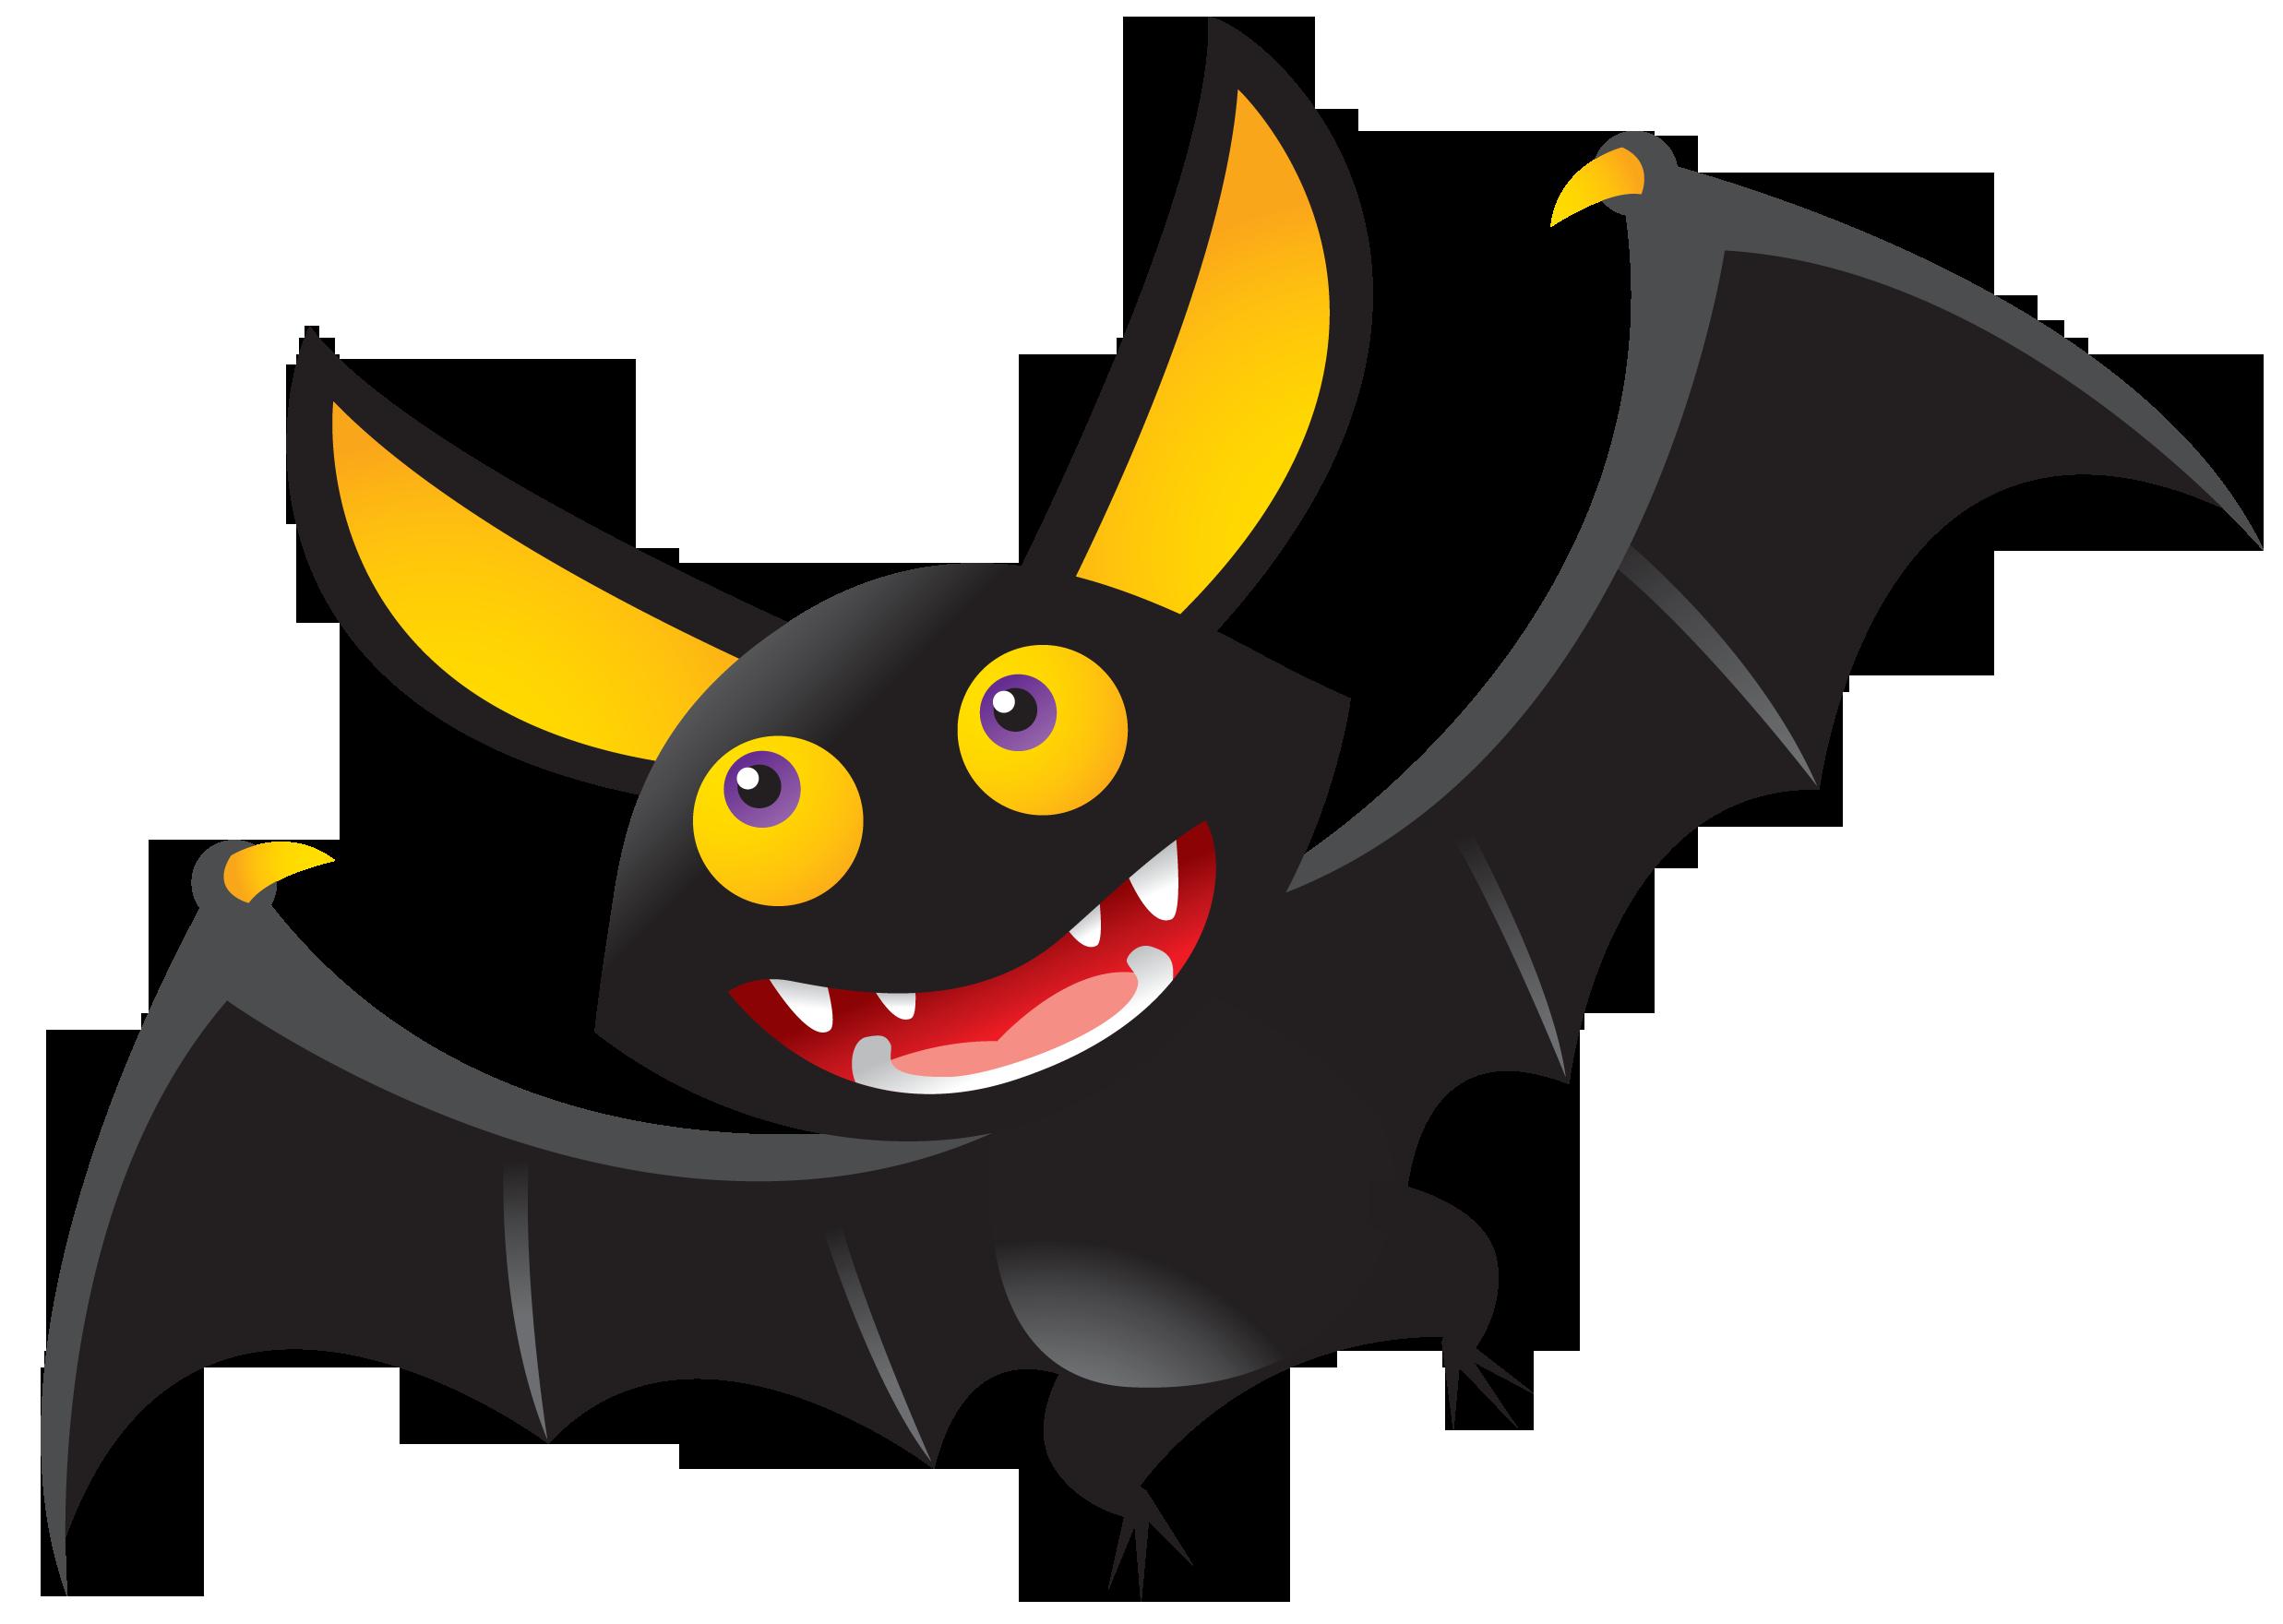 bat-clipart-pi5e9bykT.png